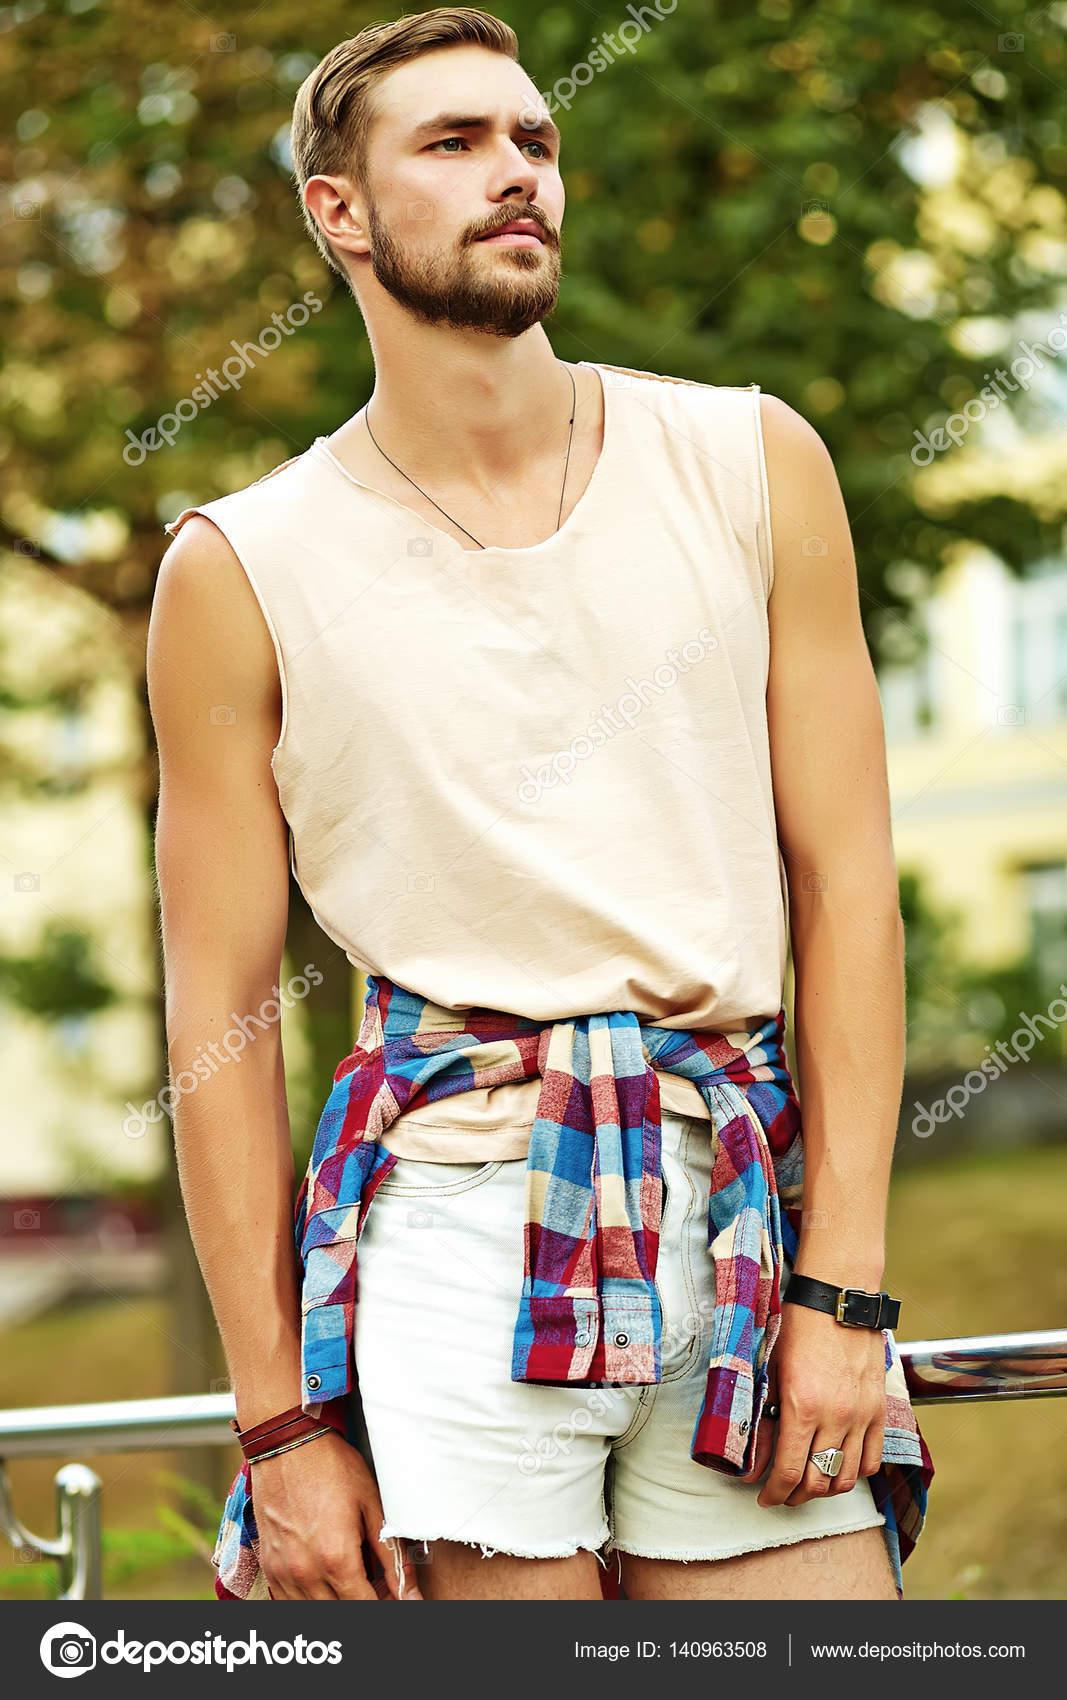 89ff41c3c Hombre de hipster hermoso modelo en ropa de verano con estilo ...